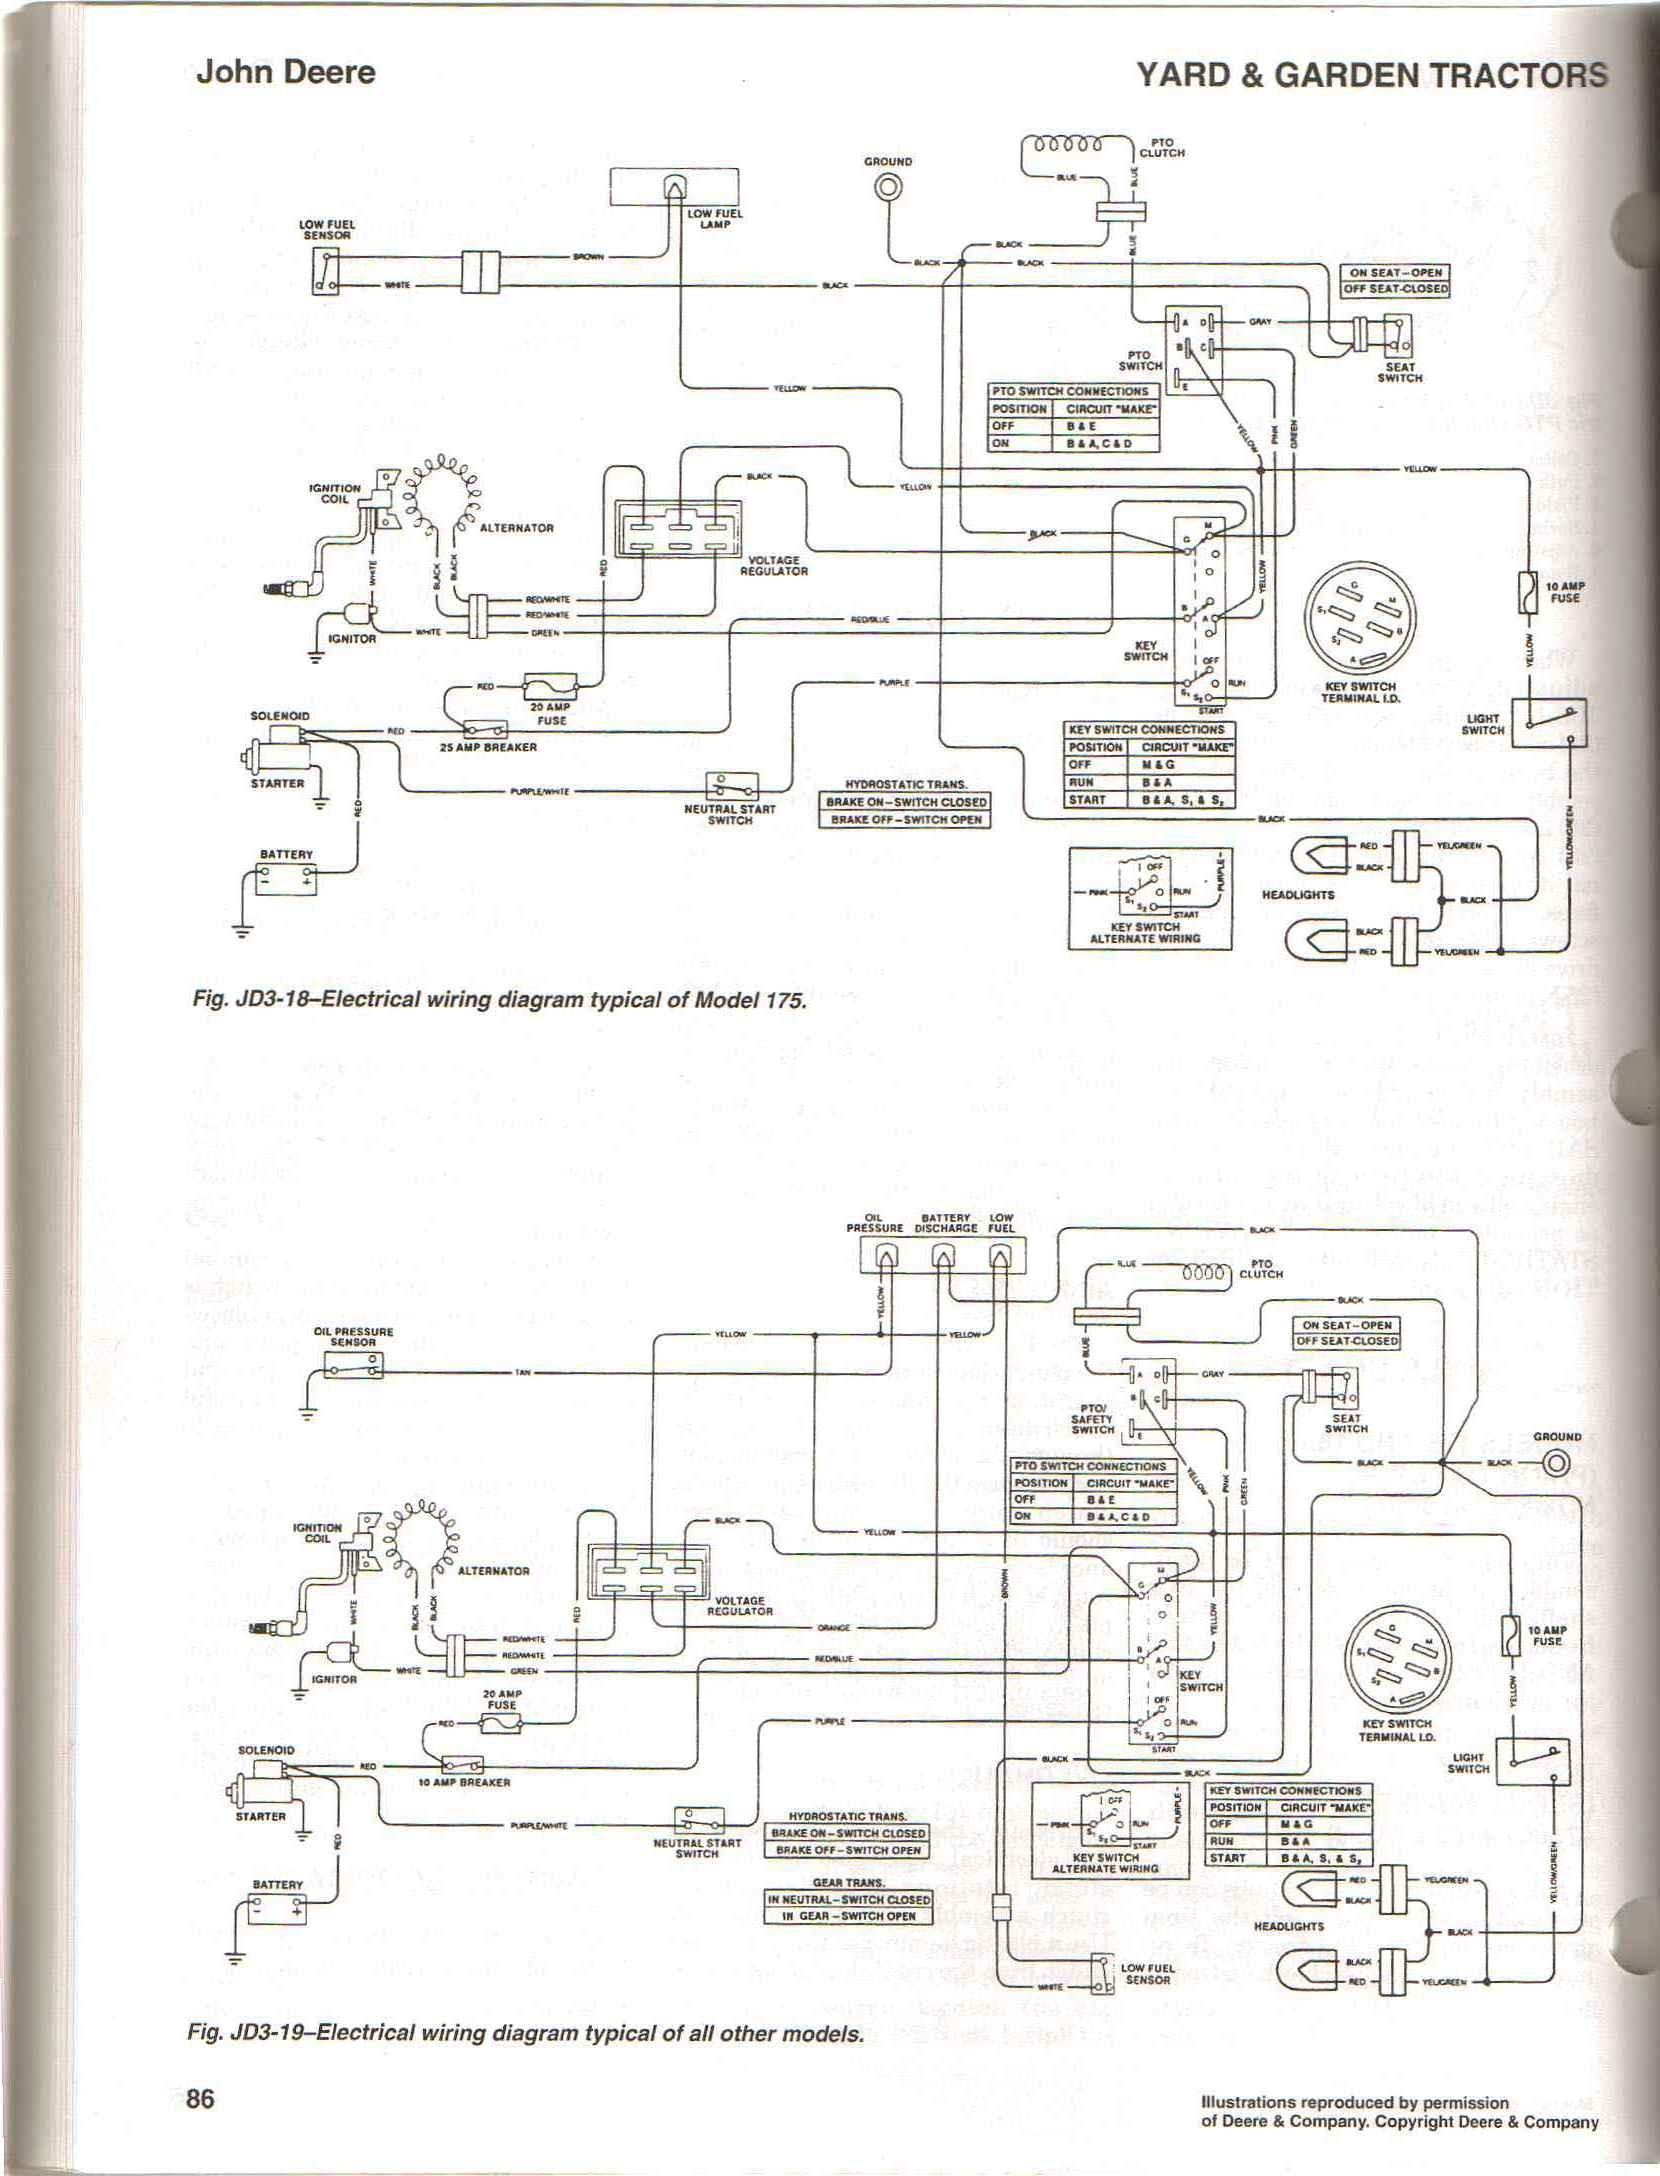 john deere gator 620i fuse box diagram wiring library John Deere Gator Electrical Schematic john deere gator xuv 620i wiring diagram somurich john deere 1 16